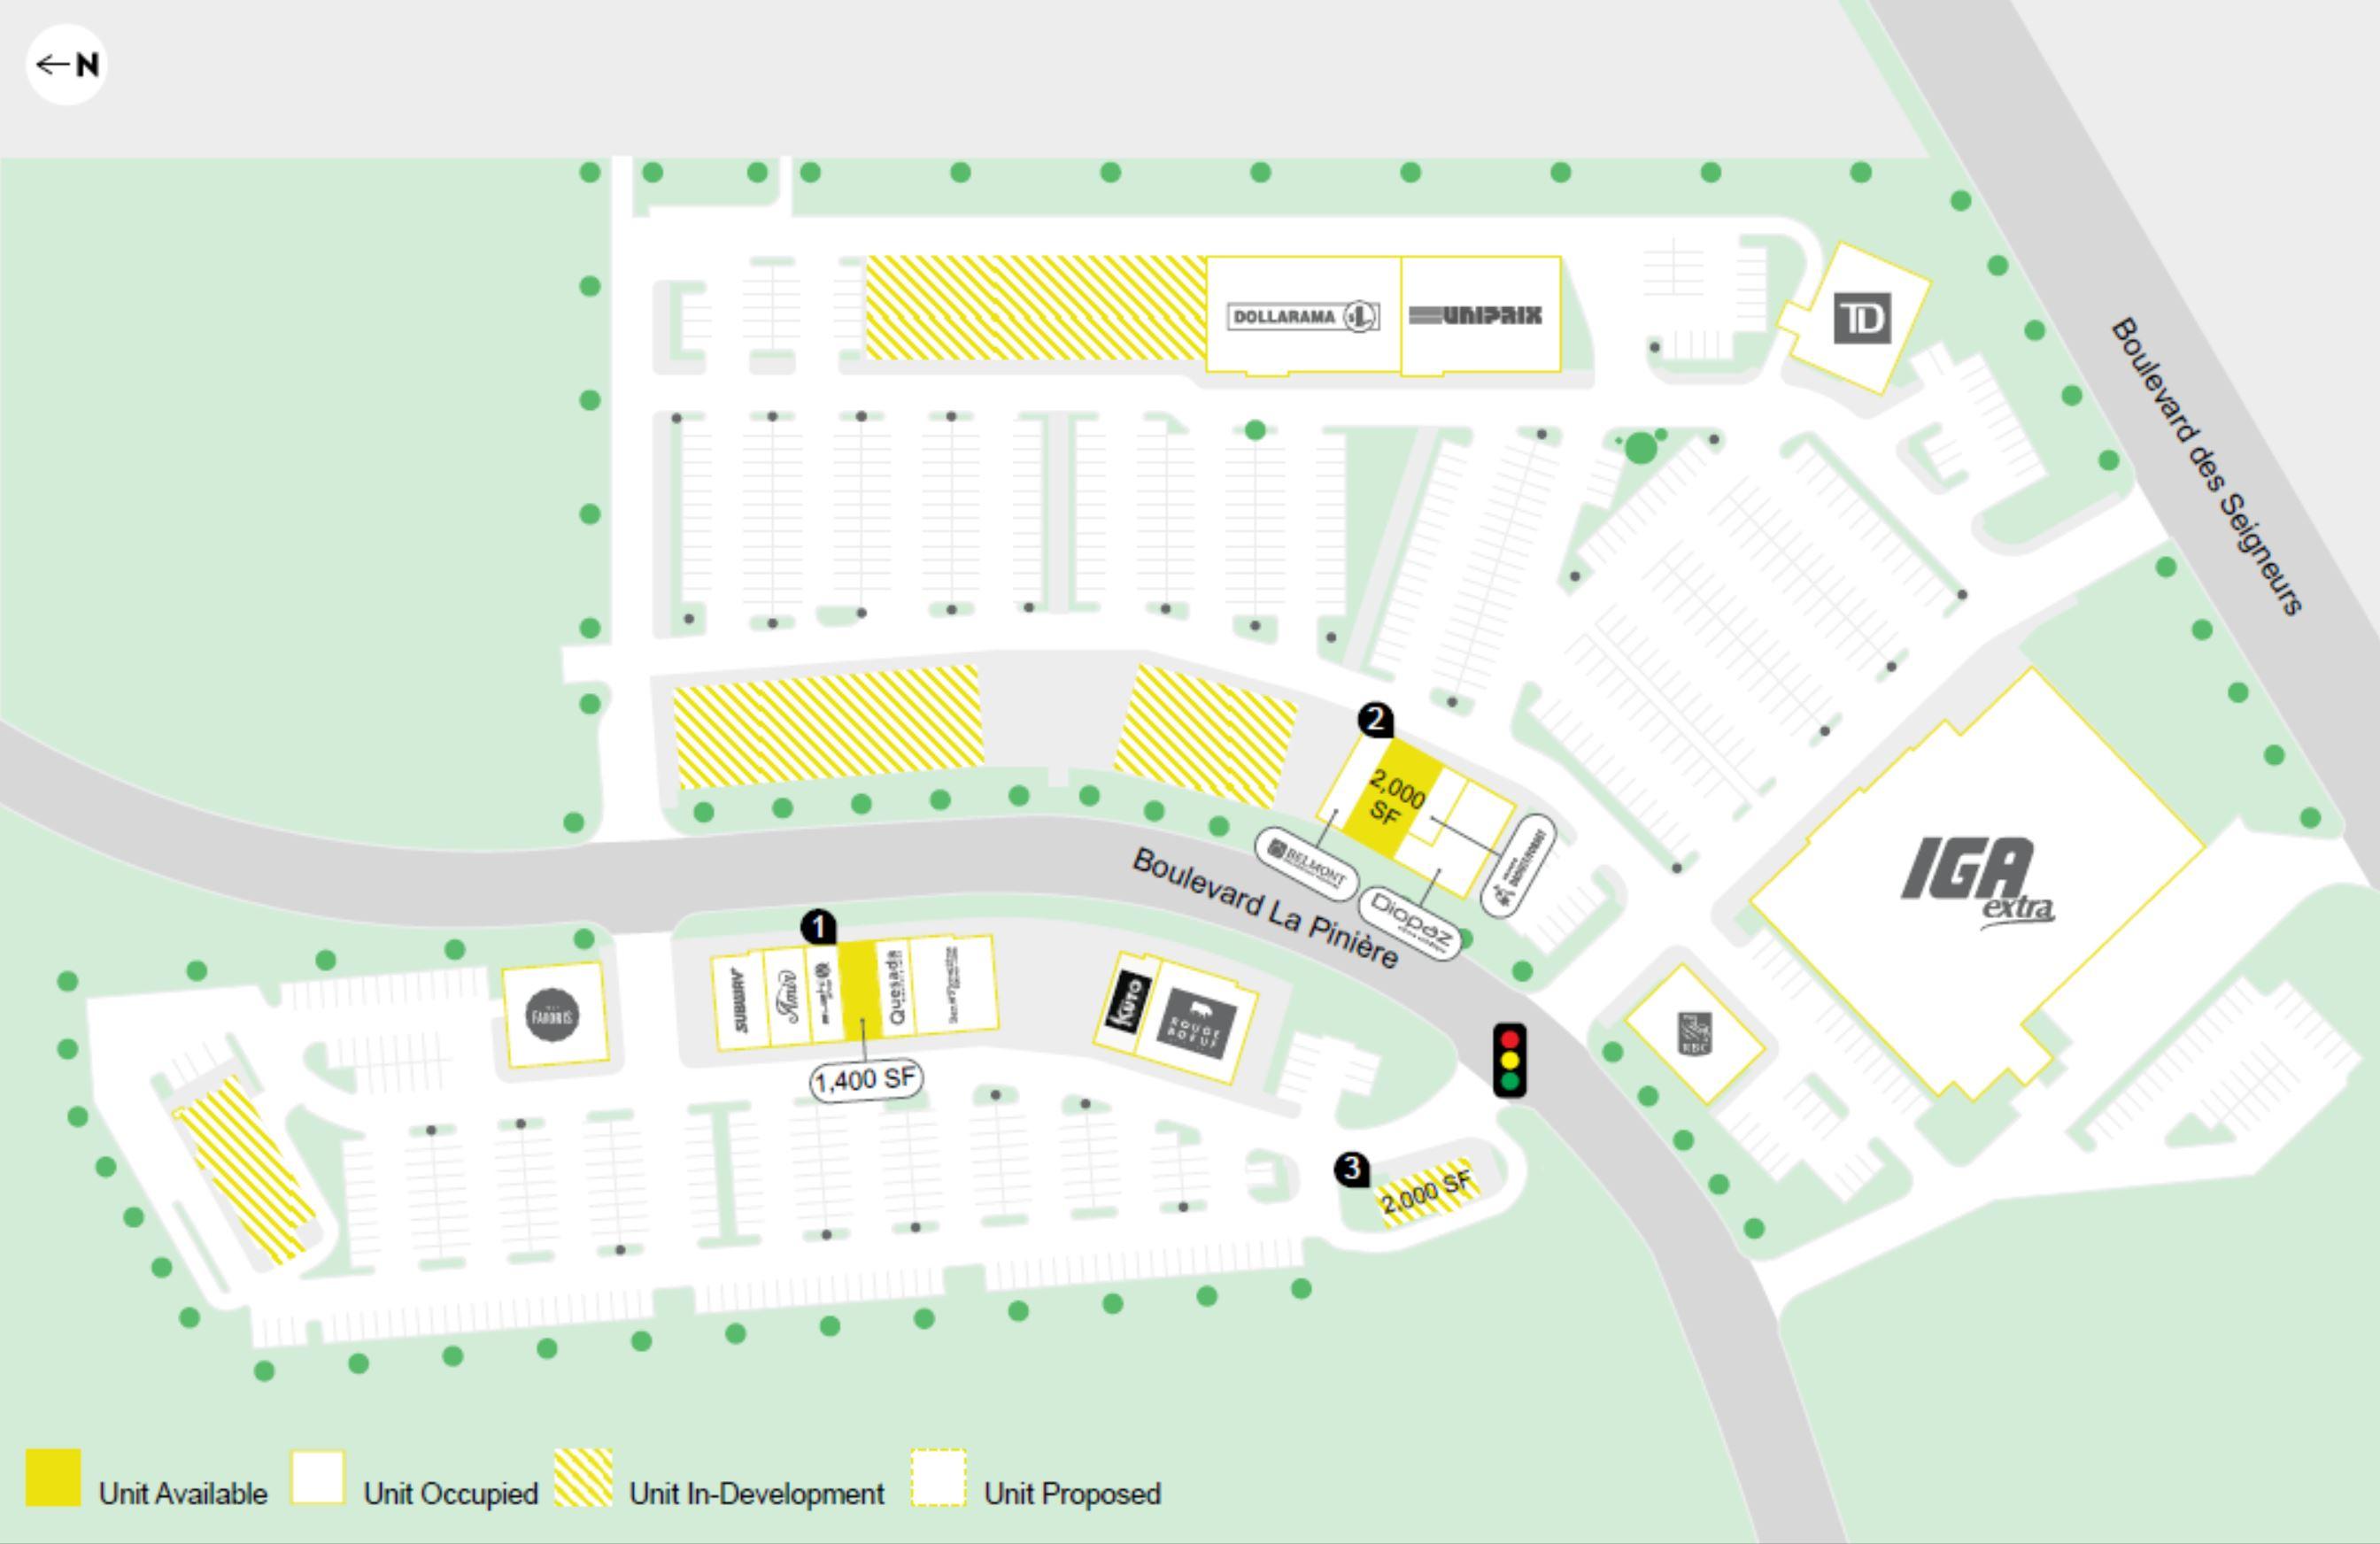 Les Promenades Terrebonne - Floor plan